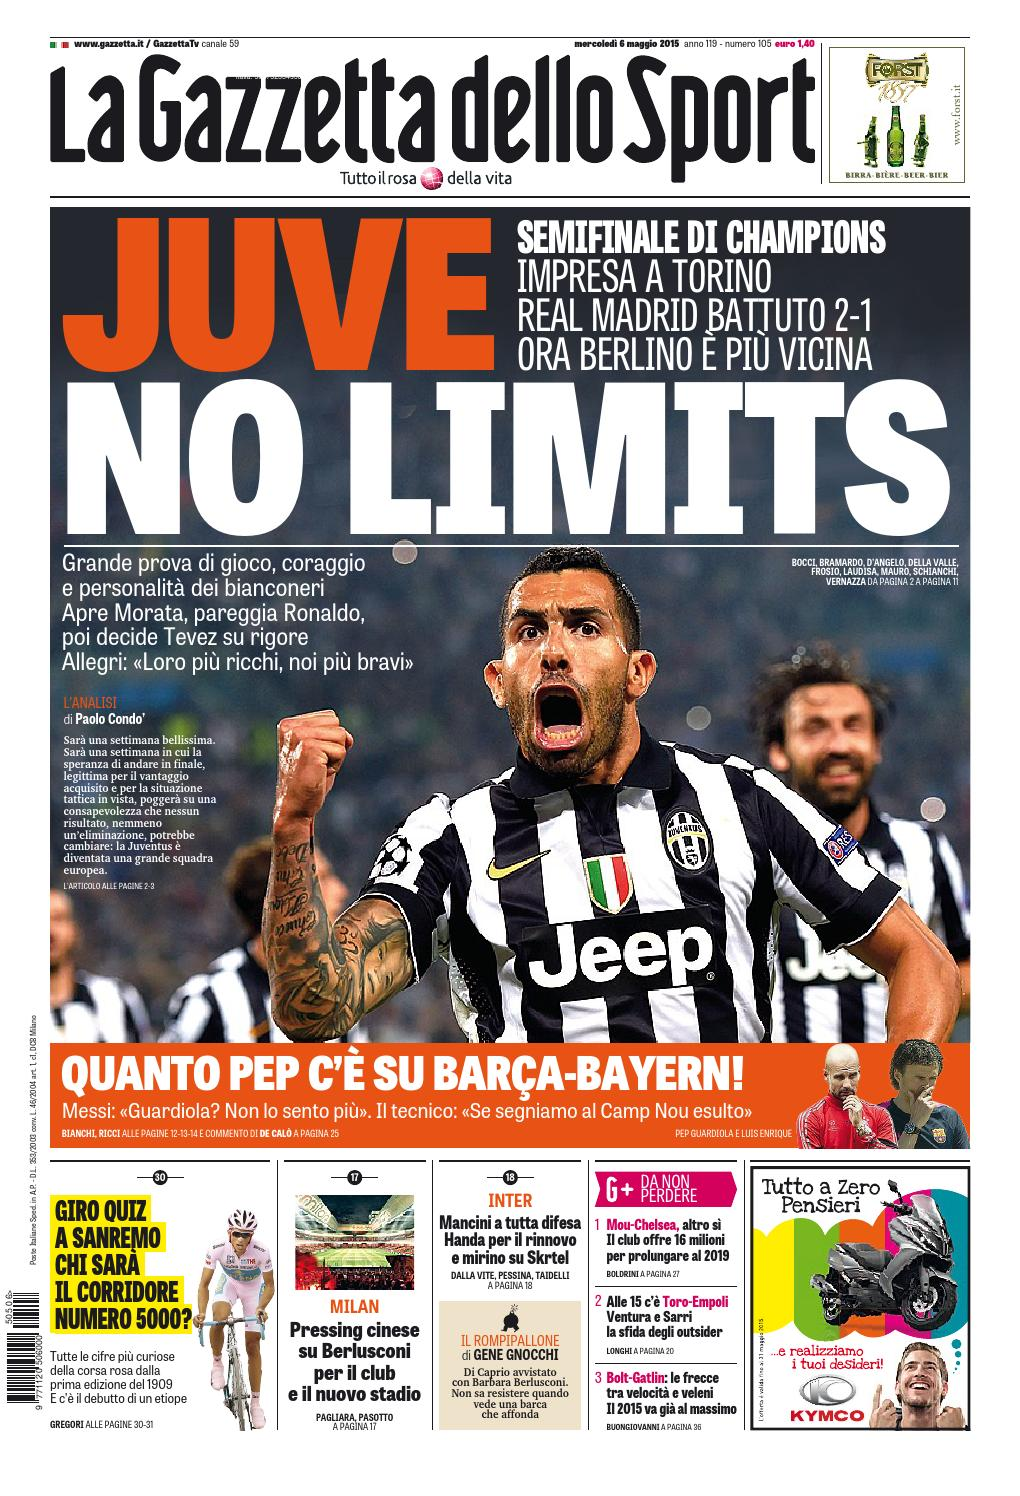 La Gazzetta dello Sport (05 06 2015) by Nguyen Duc Thinh issuu